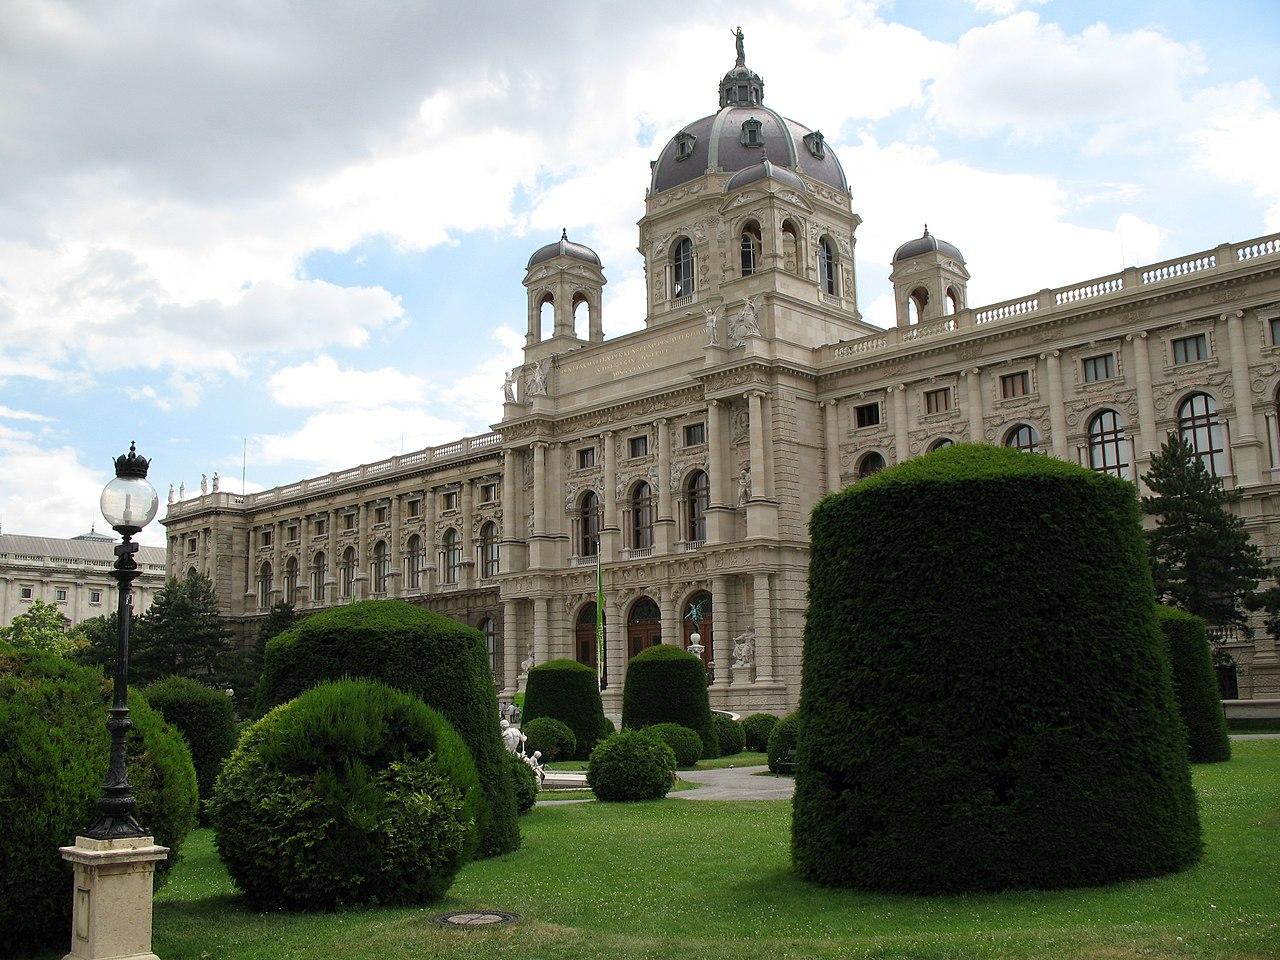 https://upload.wikimedia.org/wikipedia/commons/thumb/2/21/IMG_0089_-_Wien_-_Kunsthistorisches_Museum.JPG/1280px-IMG_0089_-_Wien_-_Kunsthistorisches_Museum.JPG